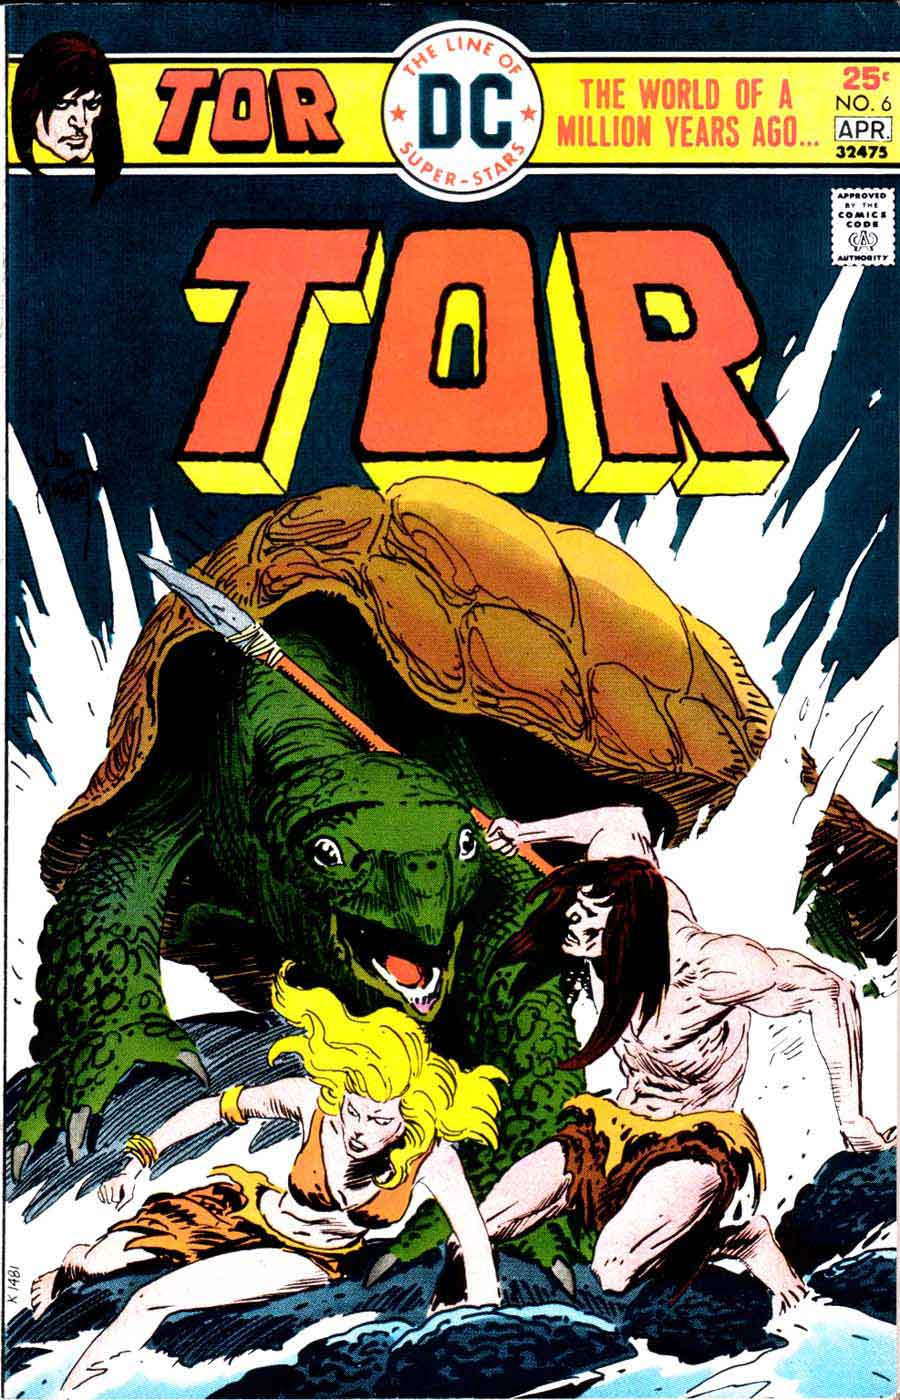 Tor v2 #6 dc bronze age comic book cover art by Joe Kubert